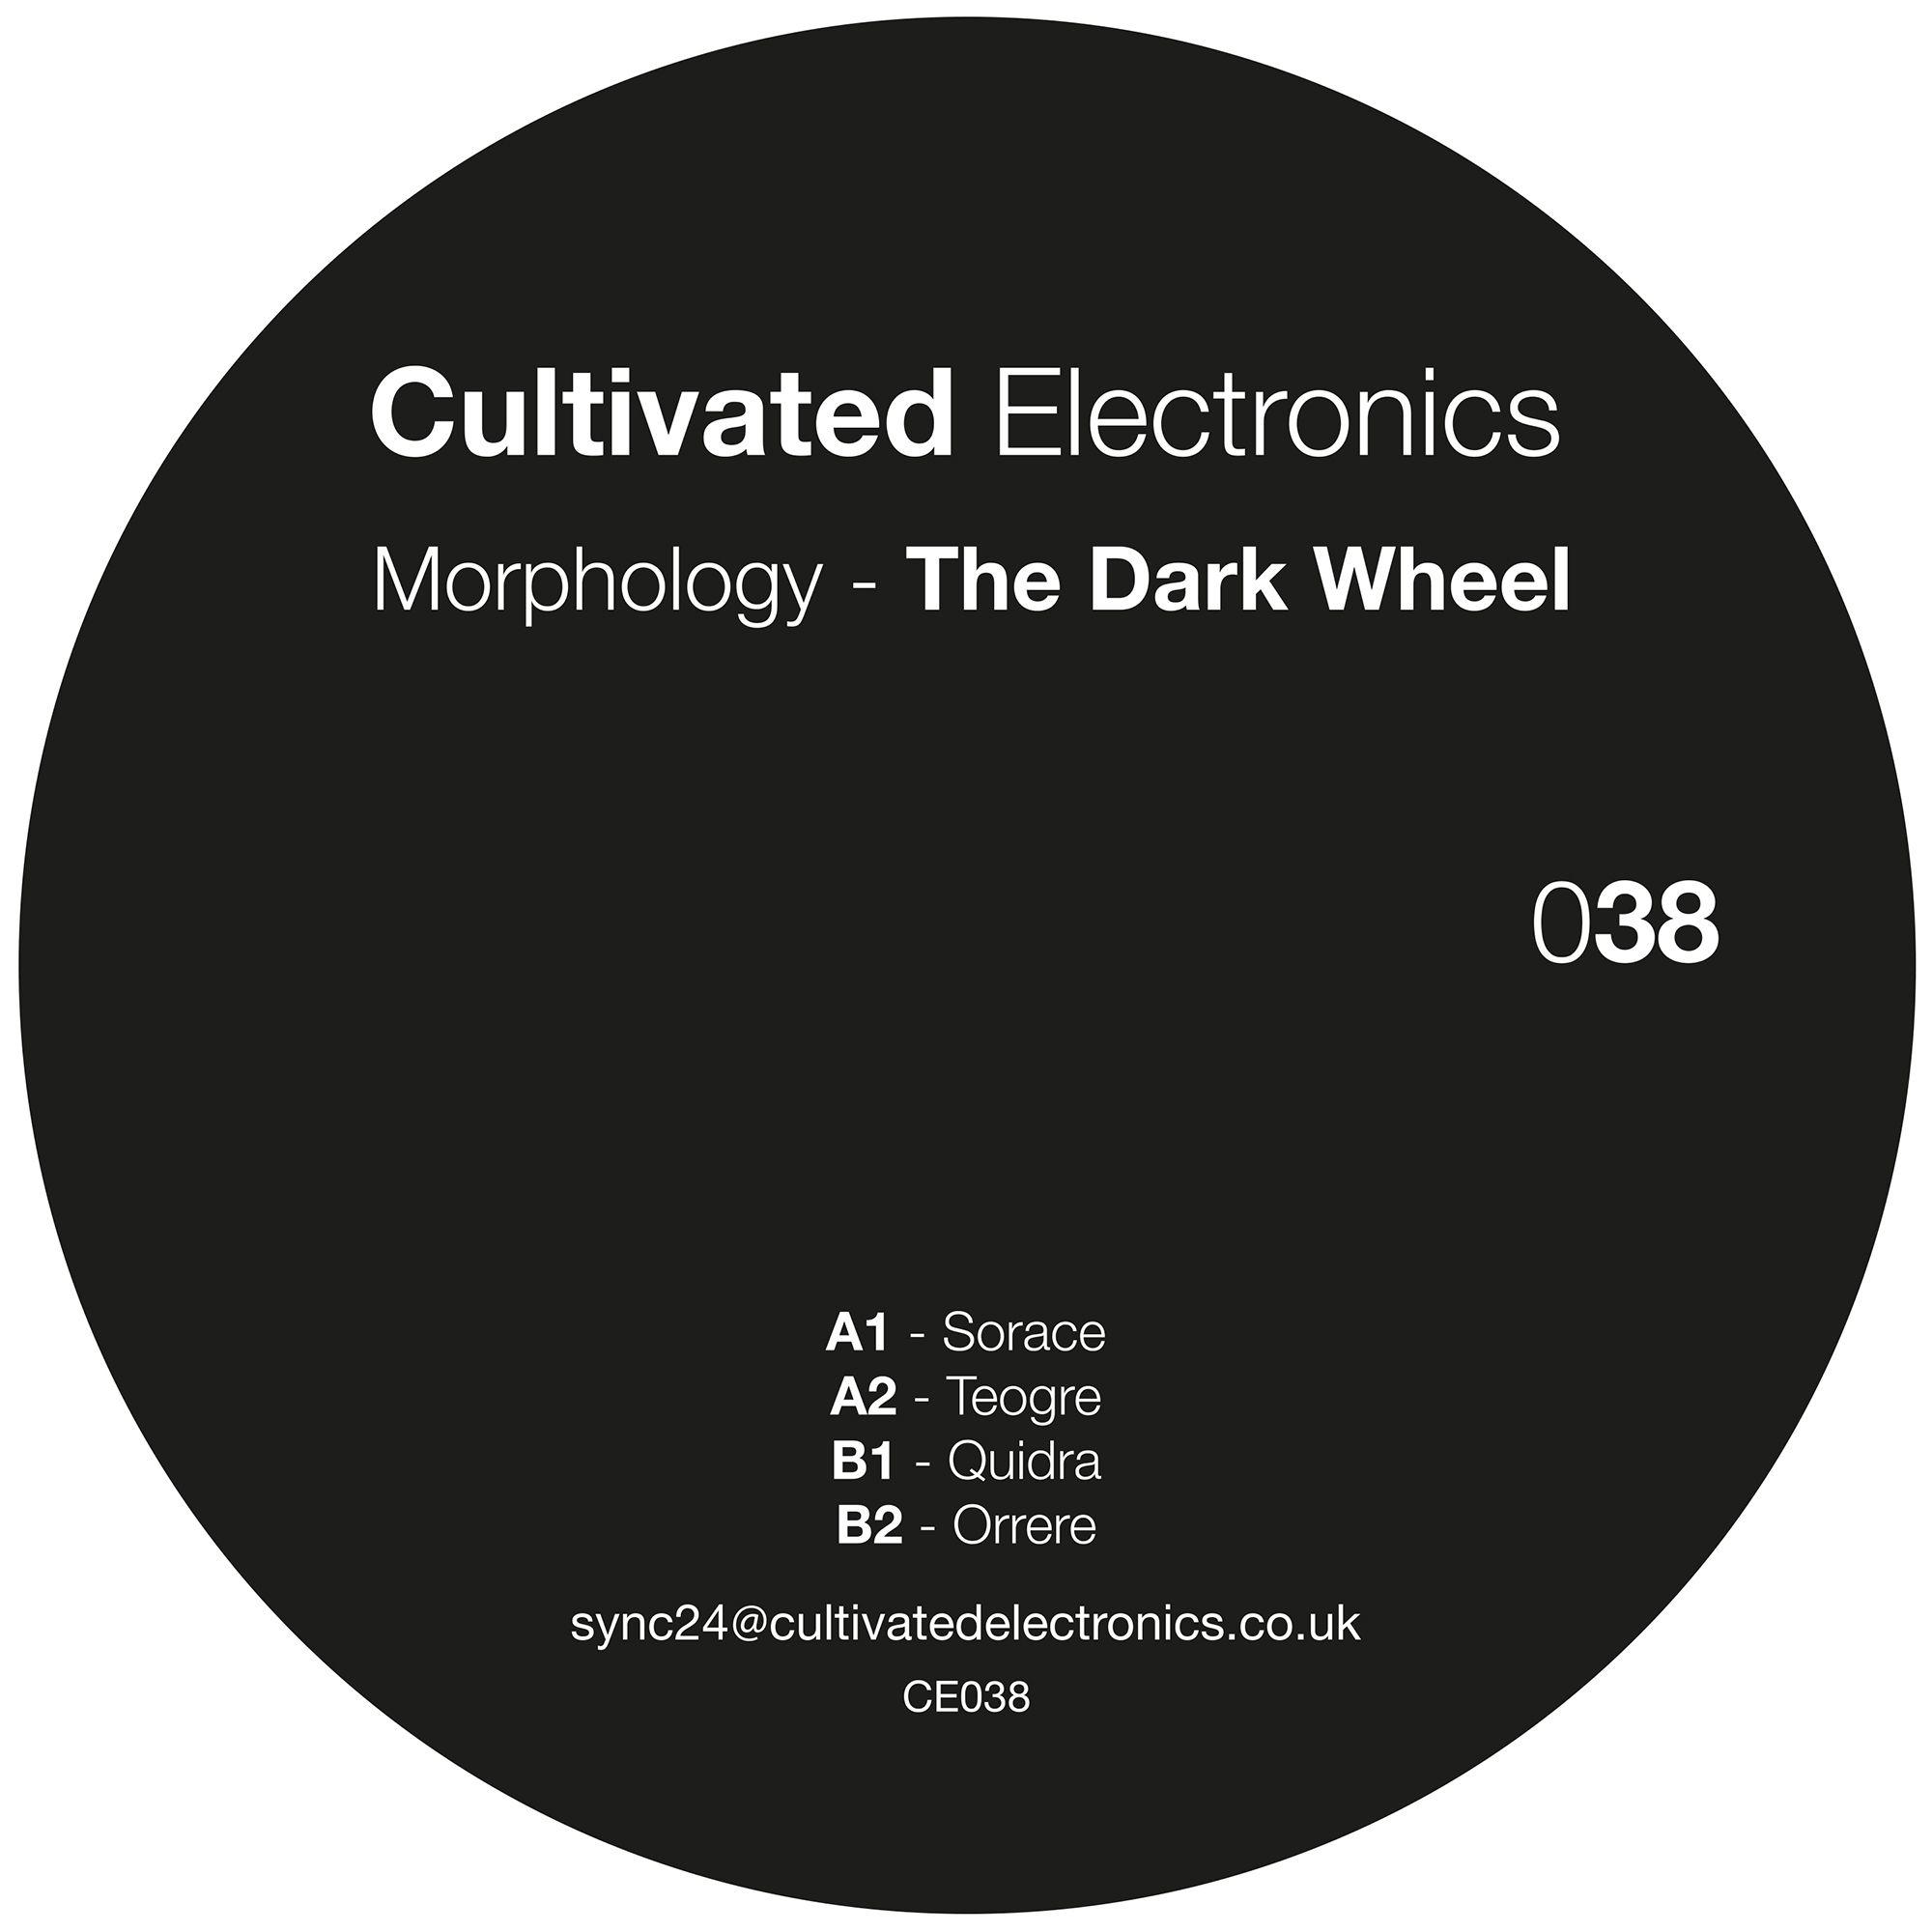 Morphology - The Dark Wheel